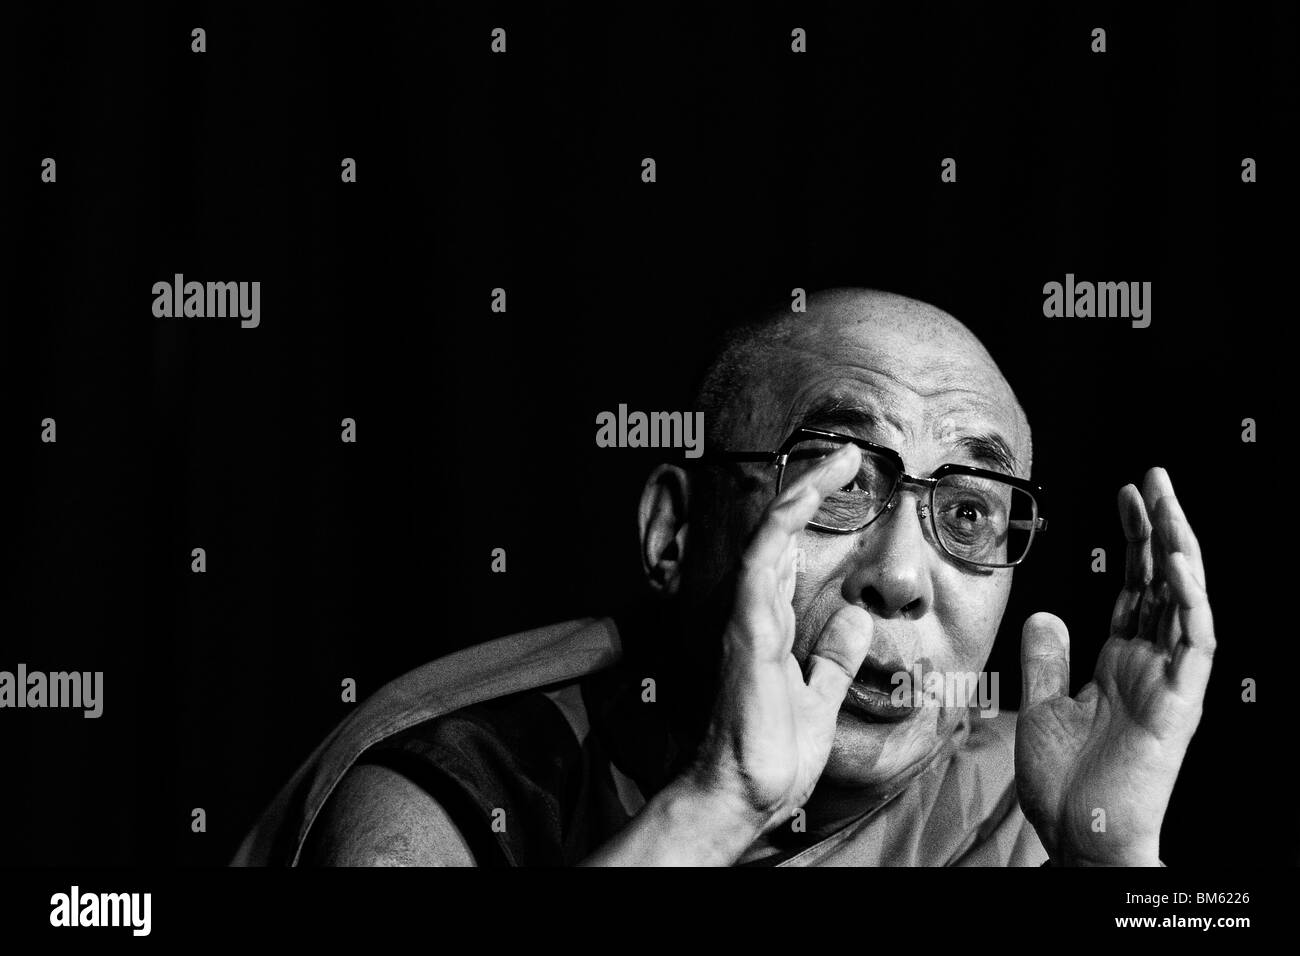 Dalai Lama Black and White Stock Photos & Images - Alamy